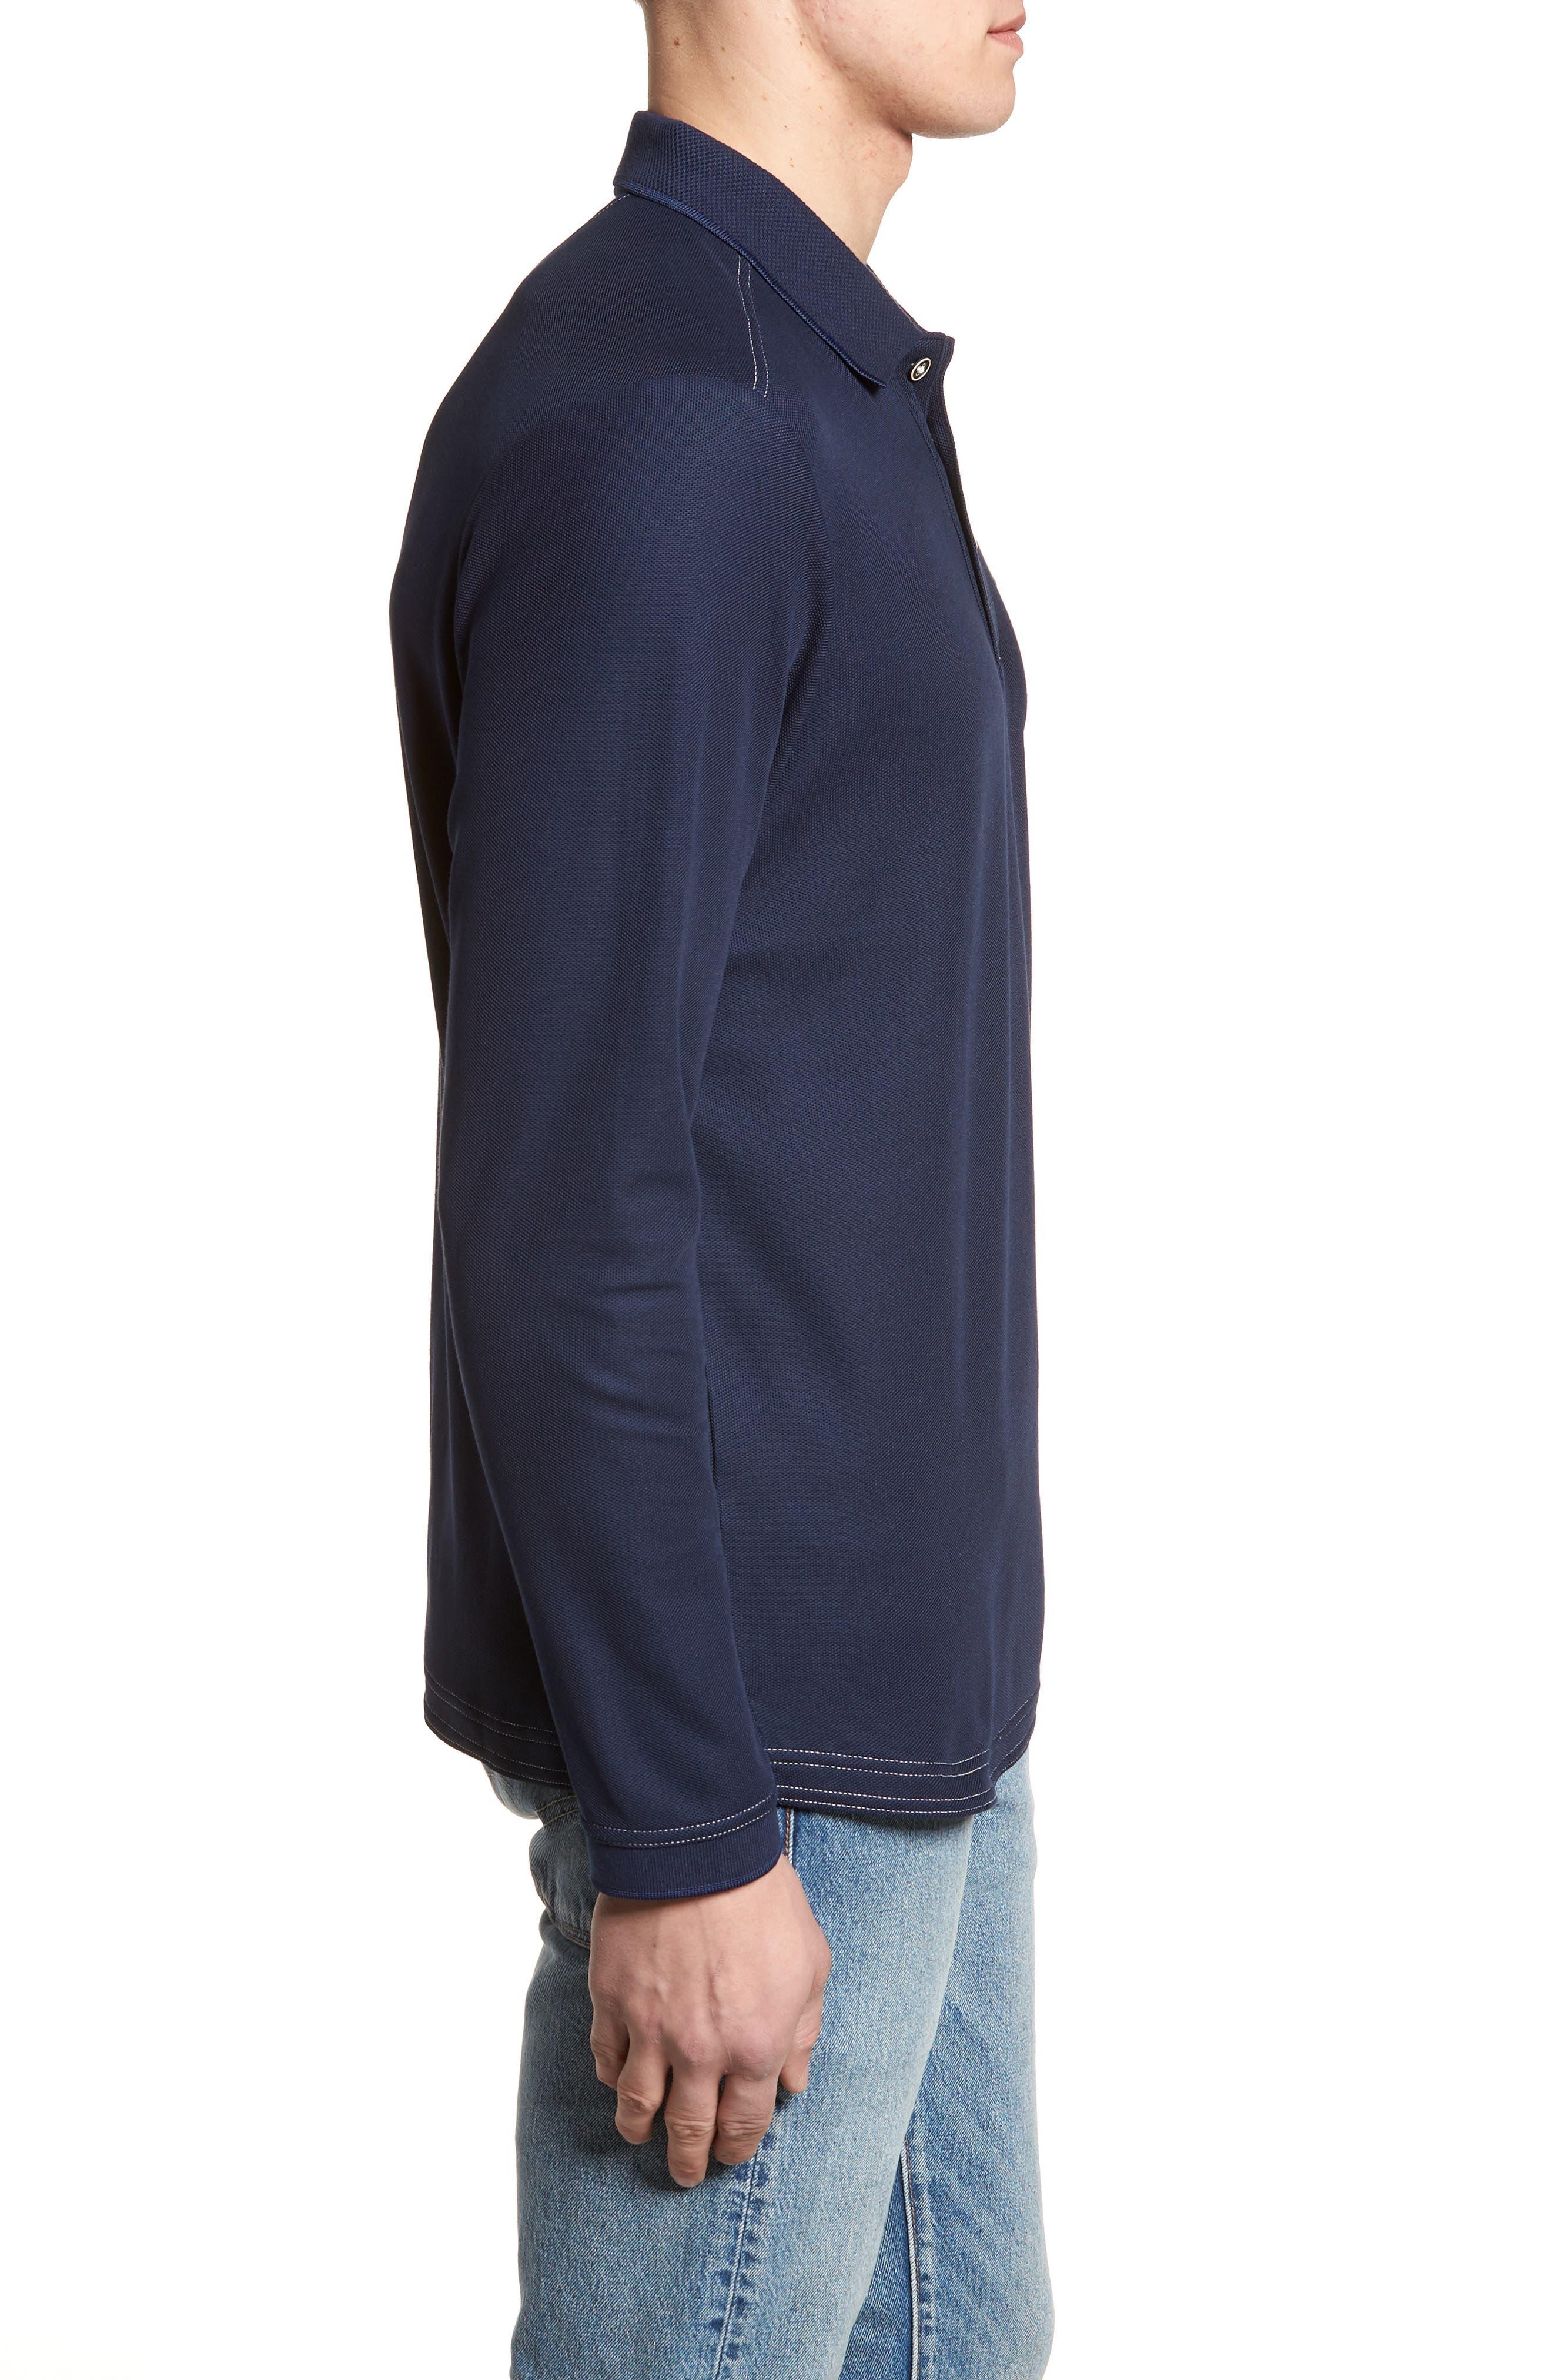 Emfielder Long Sleeve Polo,                             Alternate thumbnail 3, color,                             Blue Note